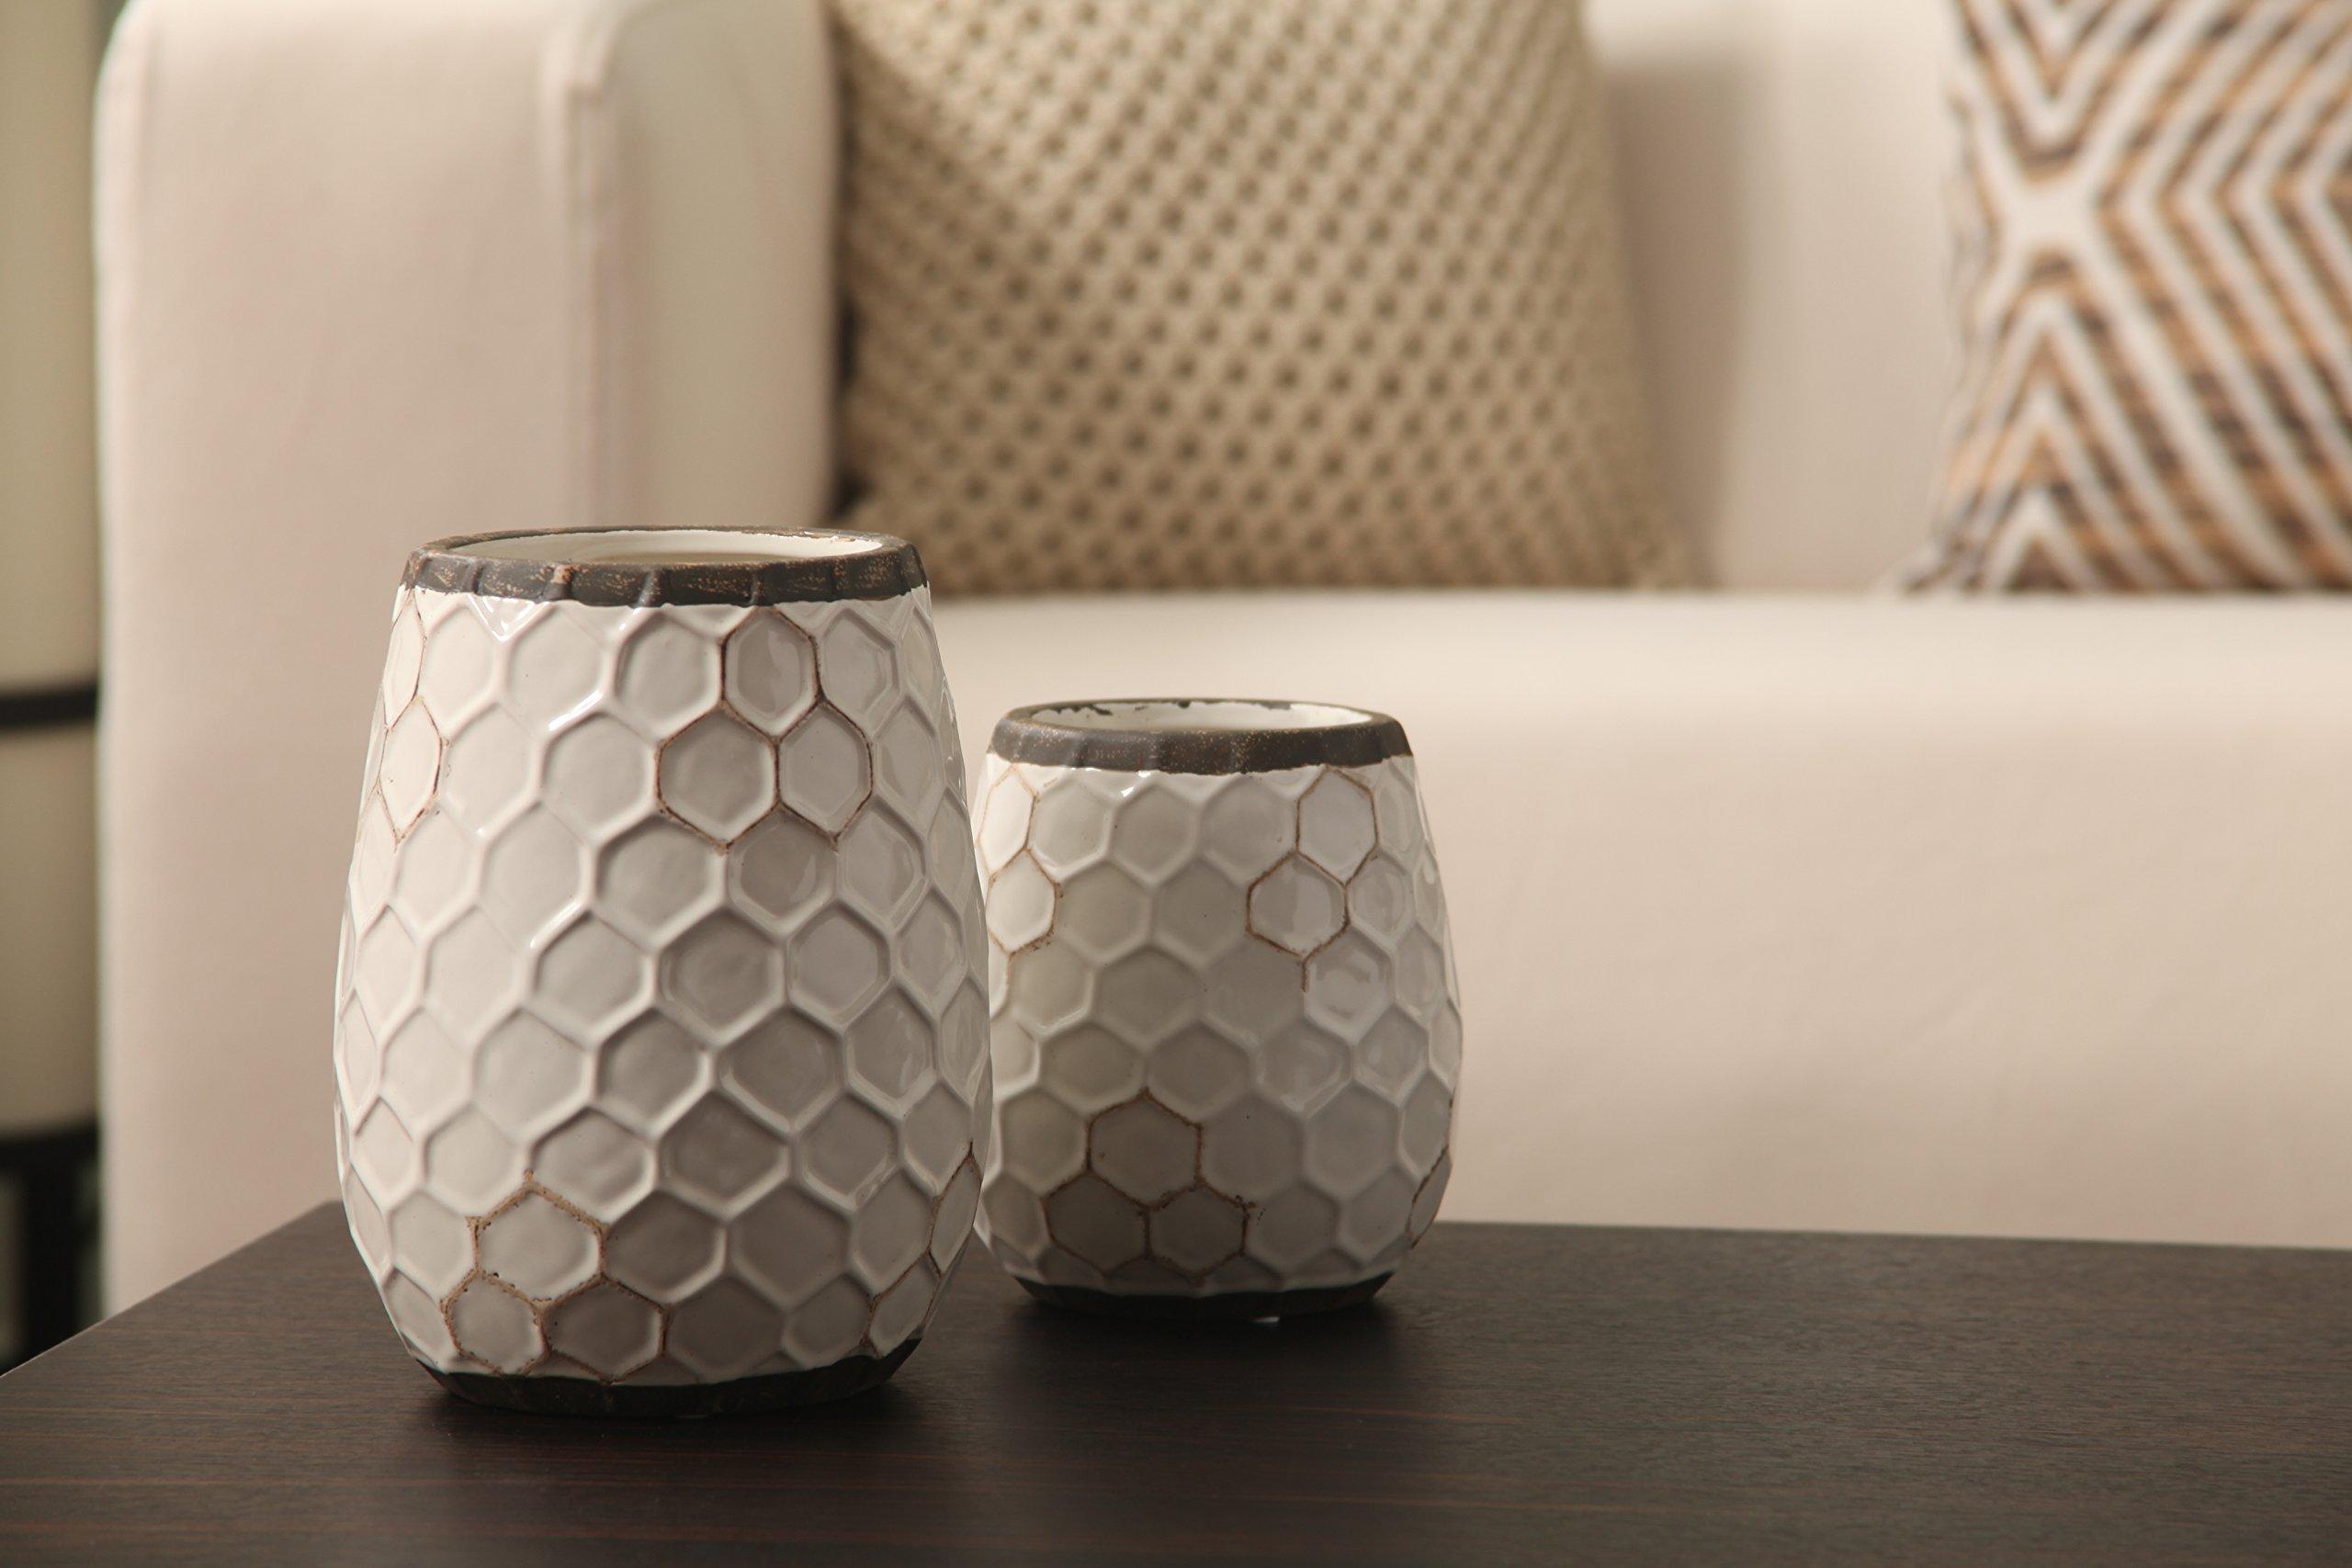 Hosley Ceramic Honeycomb Vase - 7.5'' High. Ideal Gift for Weddings, Spa, Flower Arrangements O6